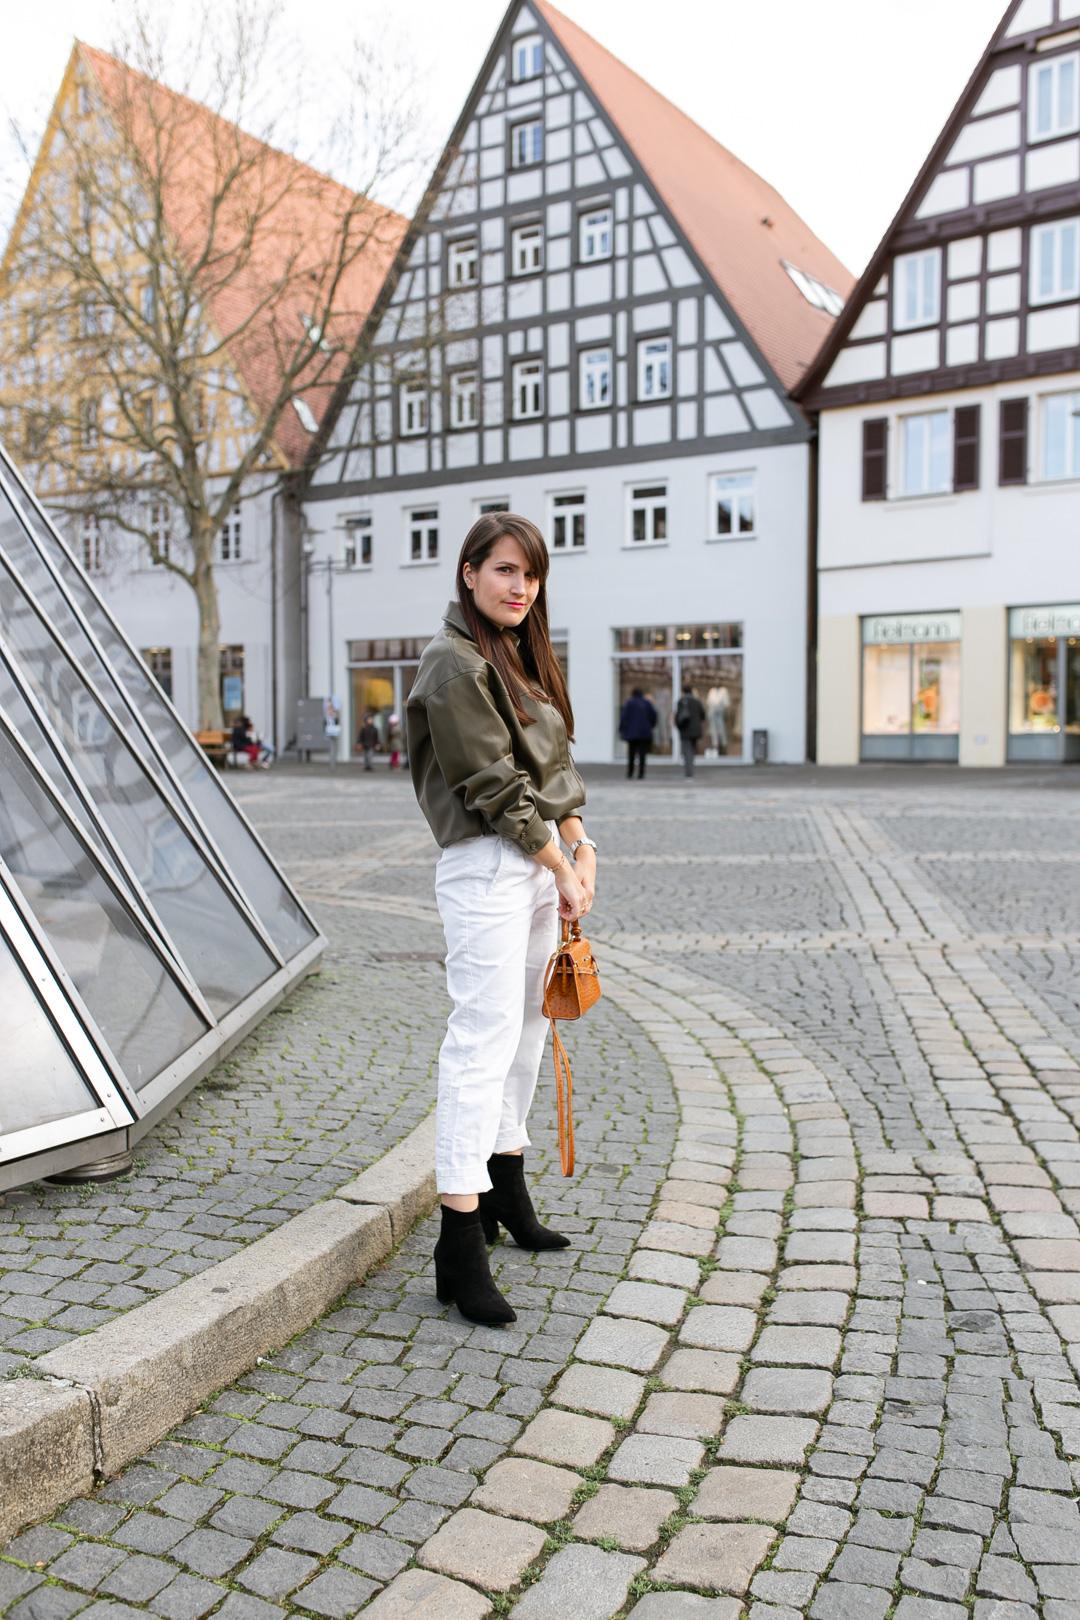 Fashion Trend Leder - Pieces of Mariposa / Fashion & Lifestyle Blog aus Nürnberg